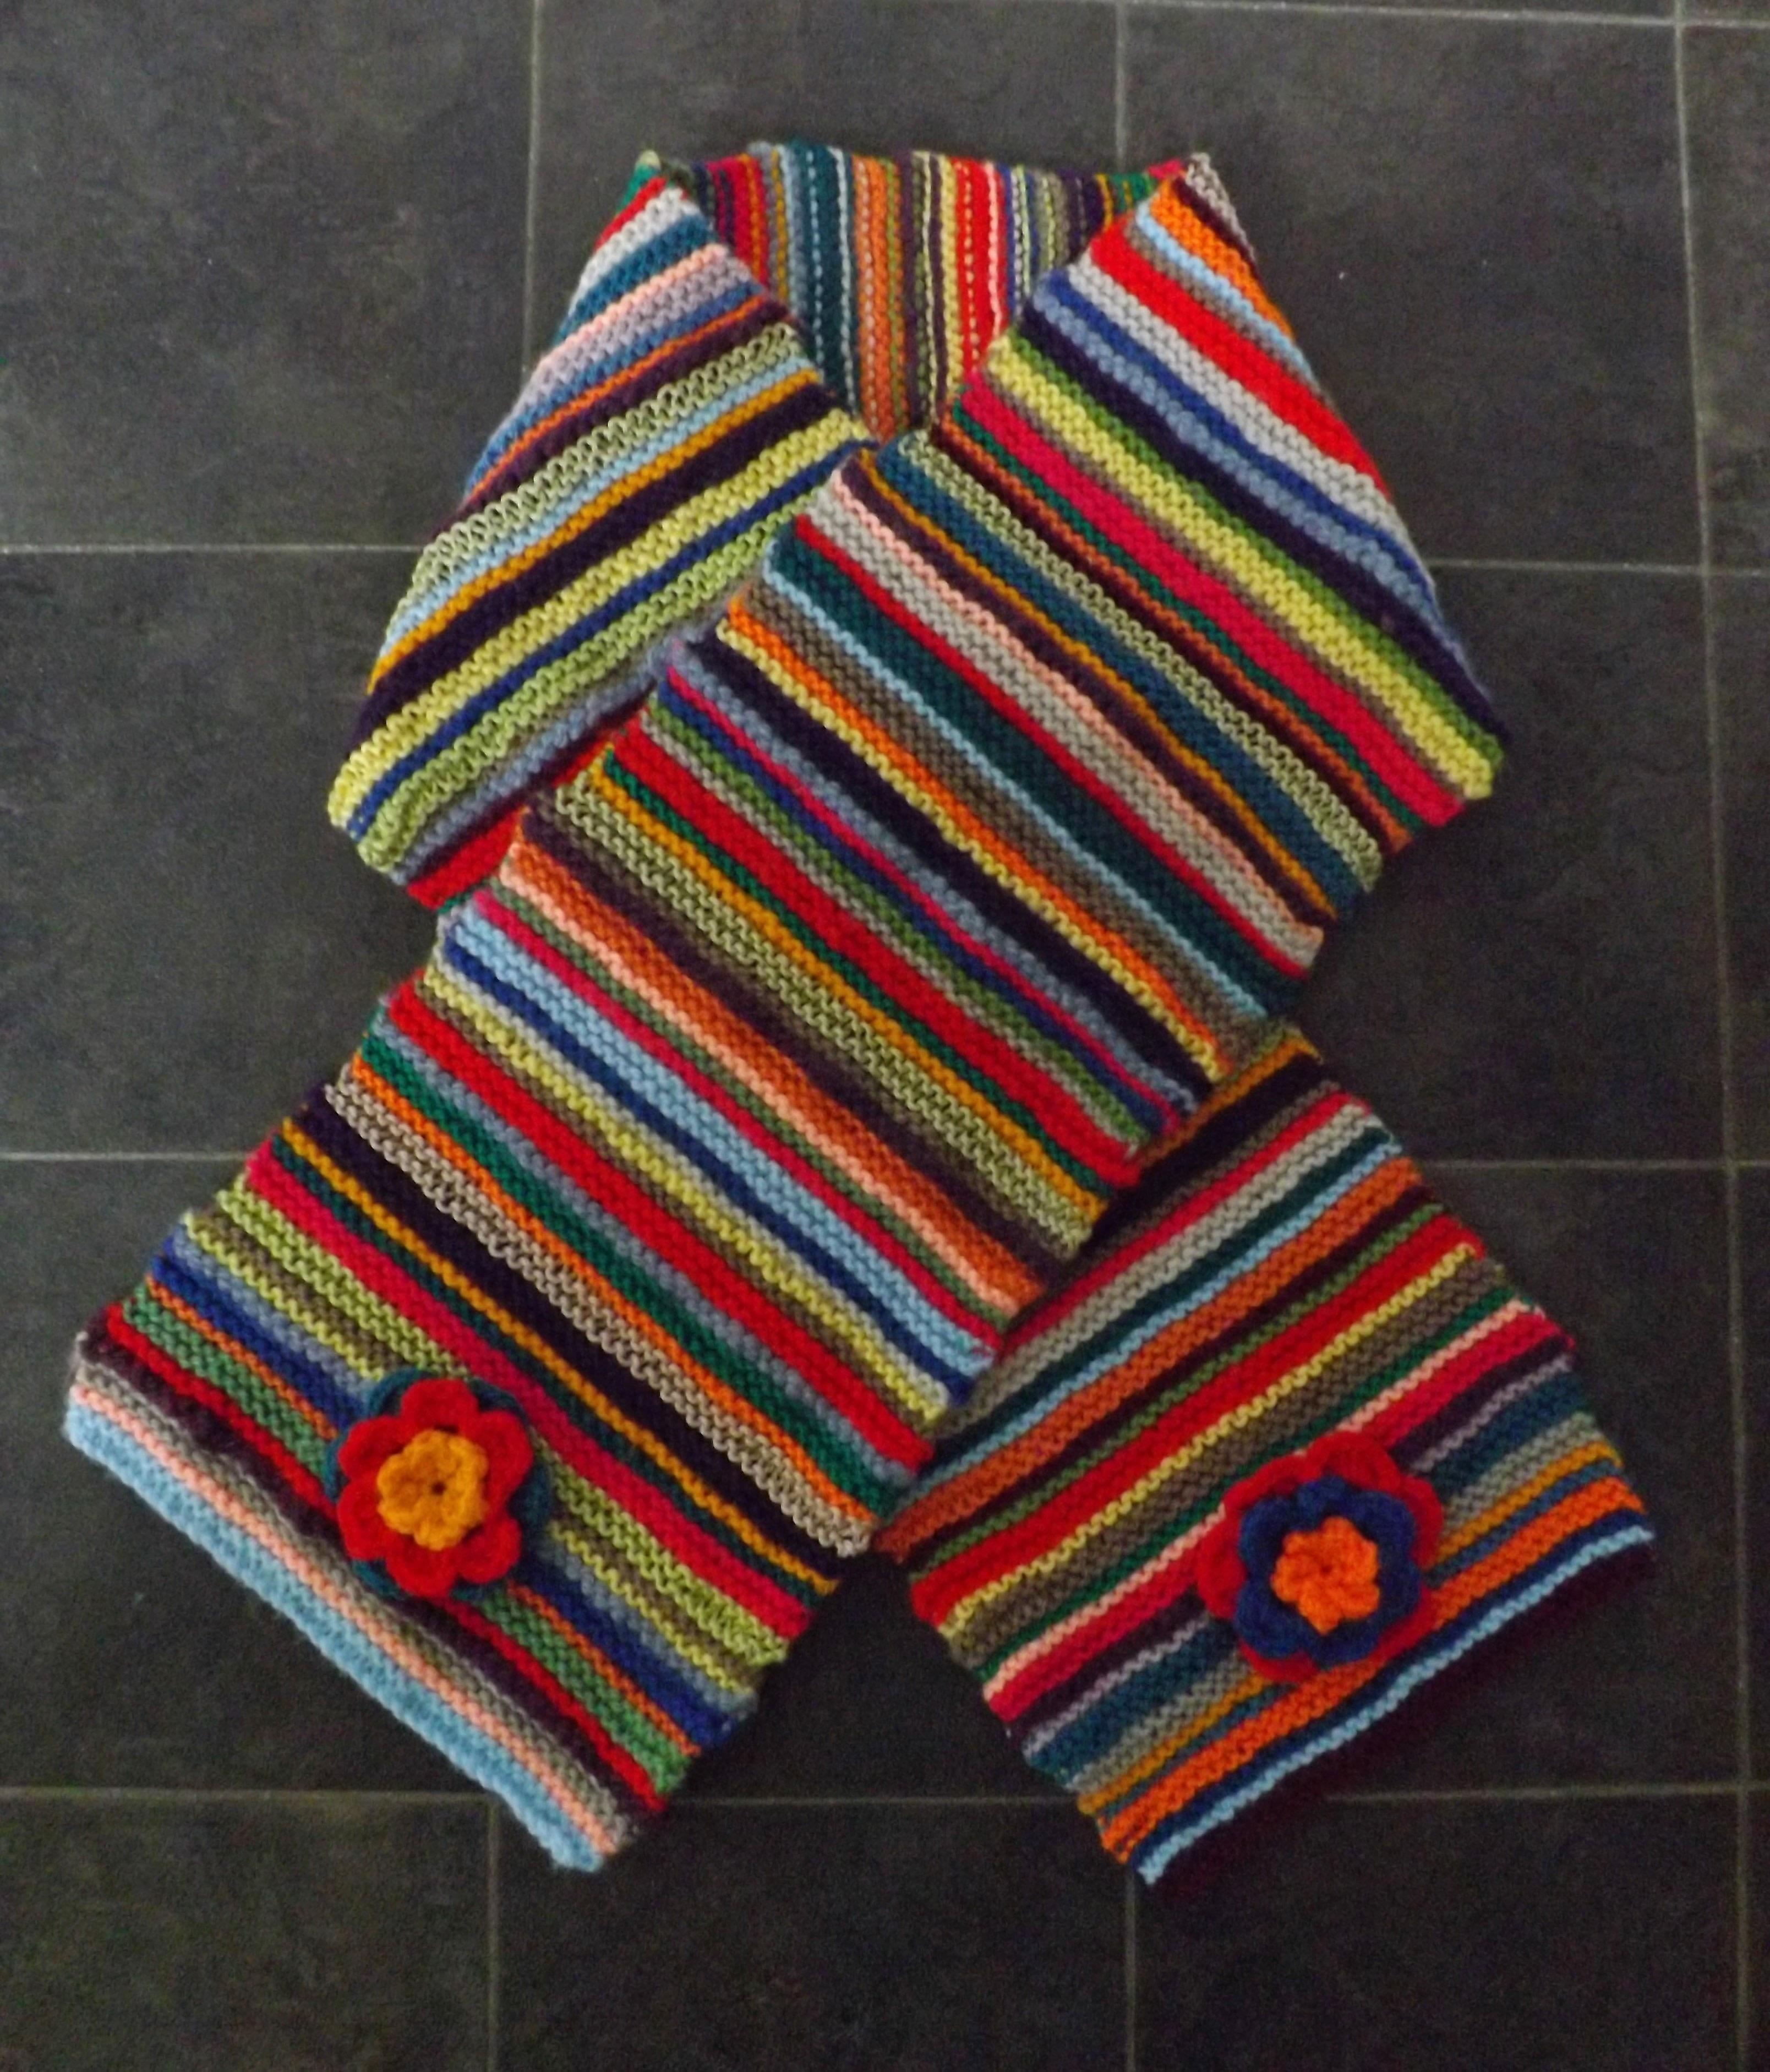 Multi Stripe Scarf · How To Knit Or Crochet A Stripy Scarf ...